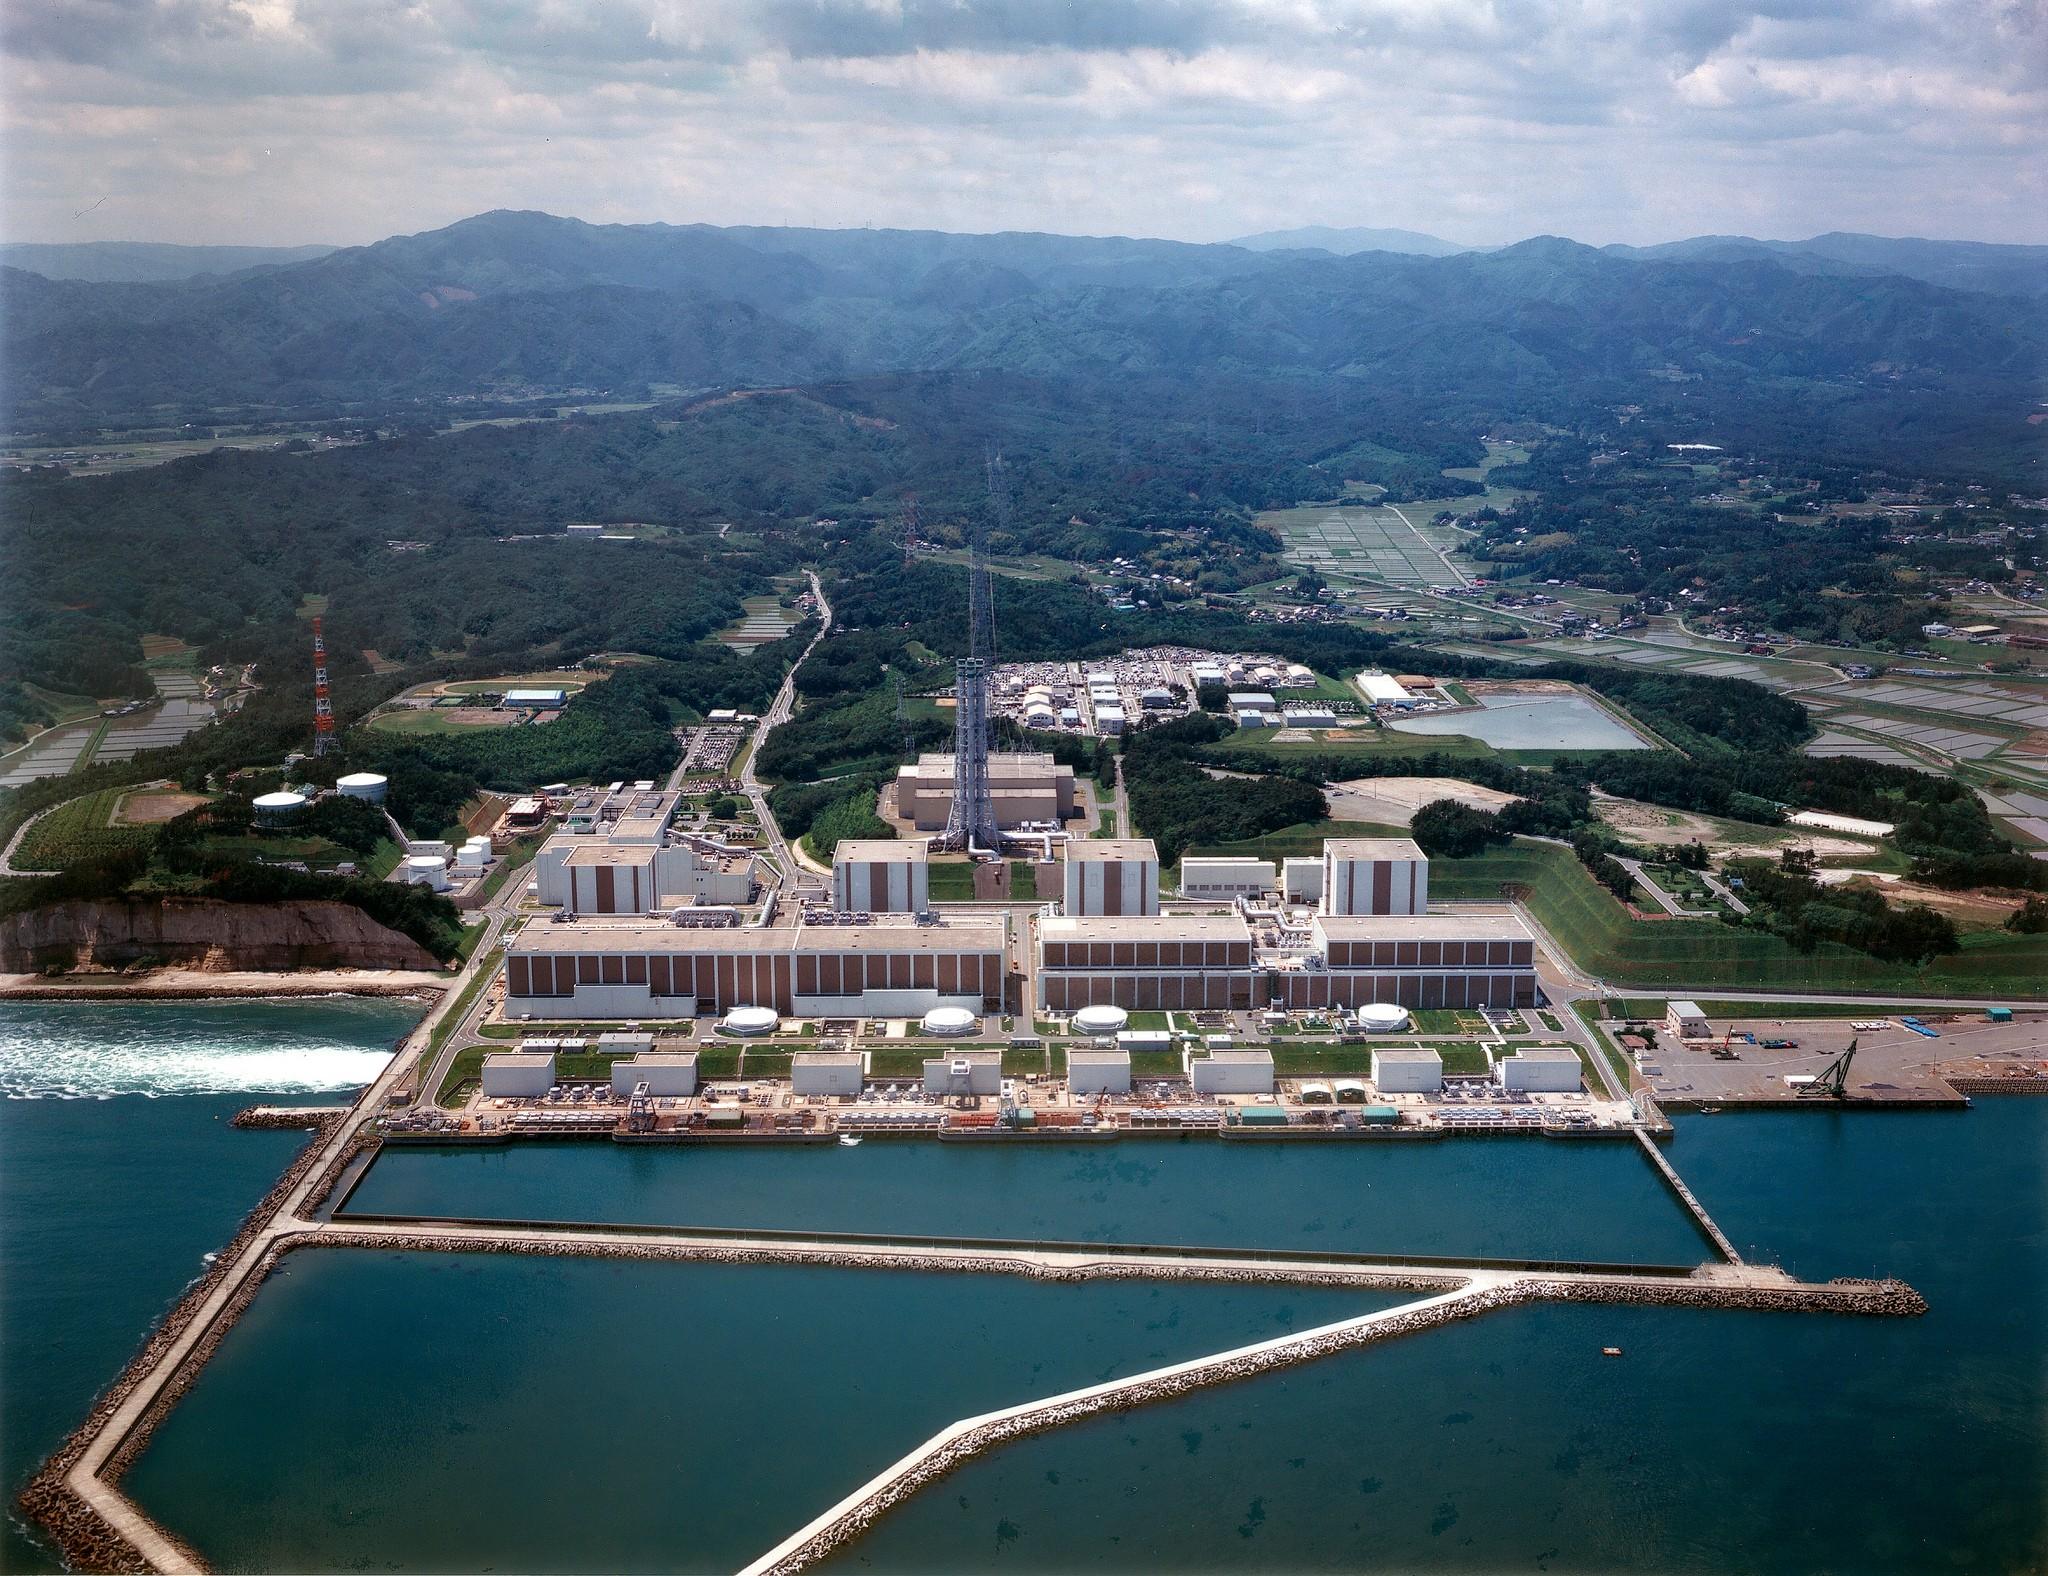 Usina nuclear de Fukushima, no Japão (Foto: Tokyo Electric Power Co., TEPCO/Flickr/IAEA Imagebank/Creative Commons)